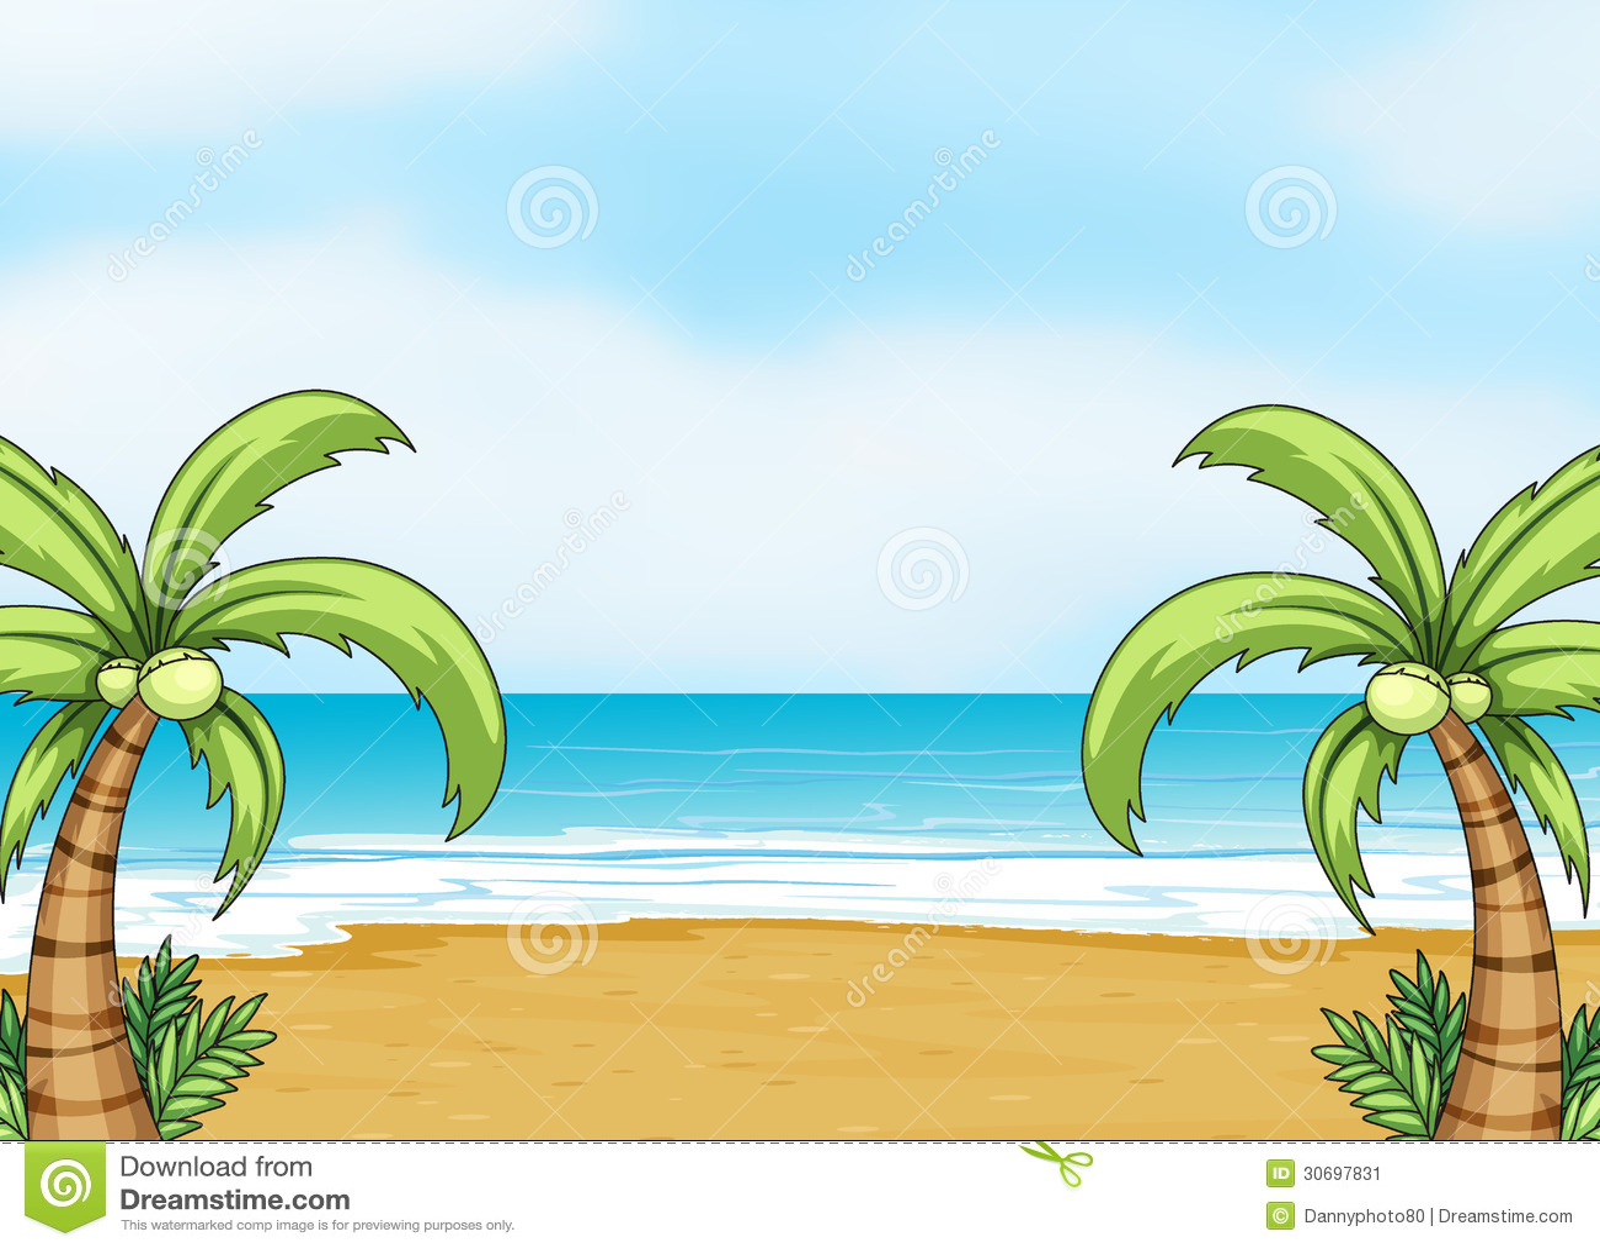 A Sea Shore Stock Image Image 30697831